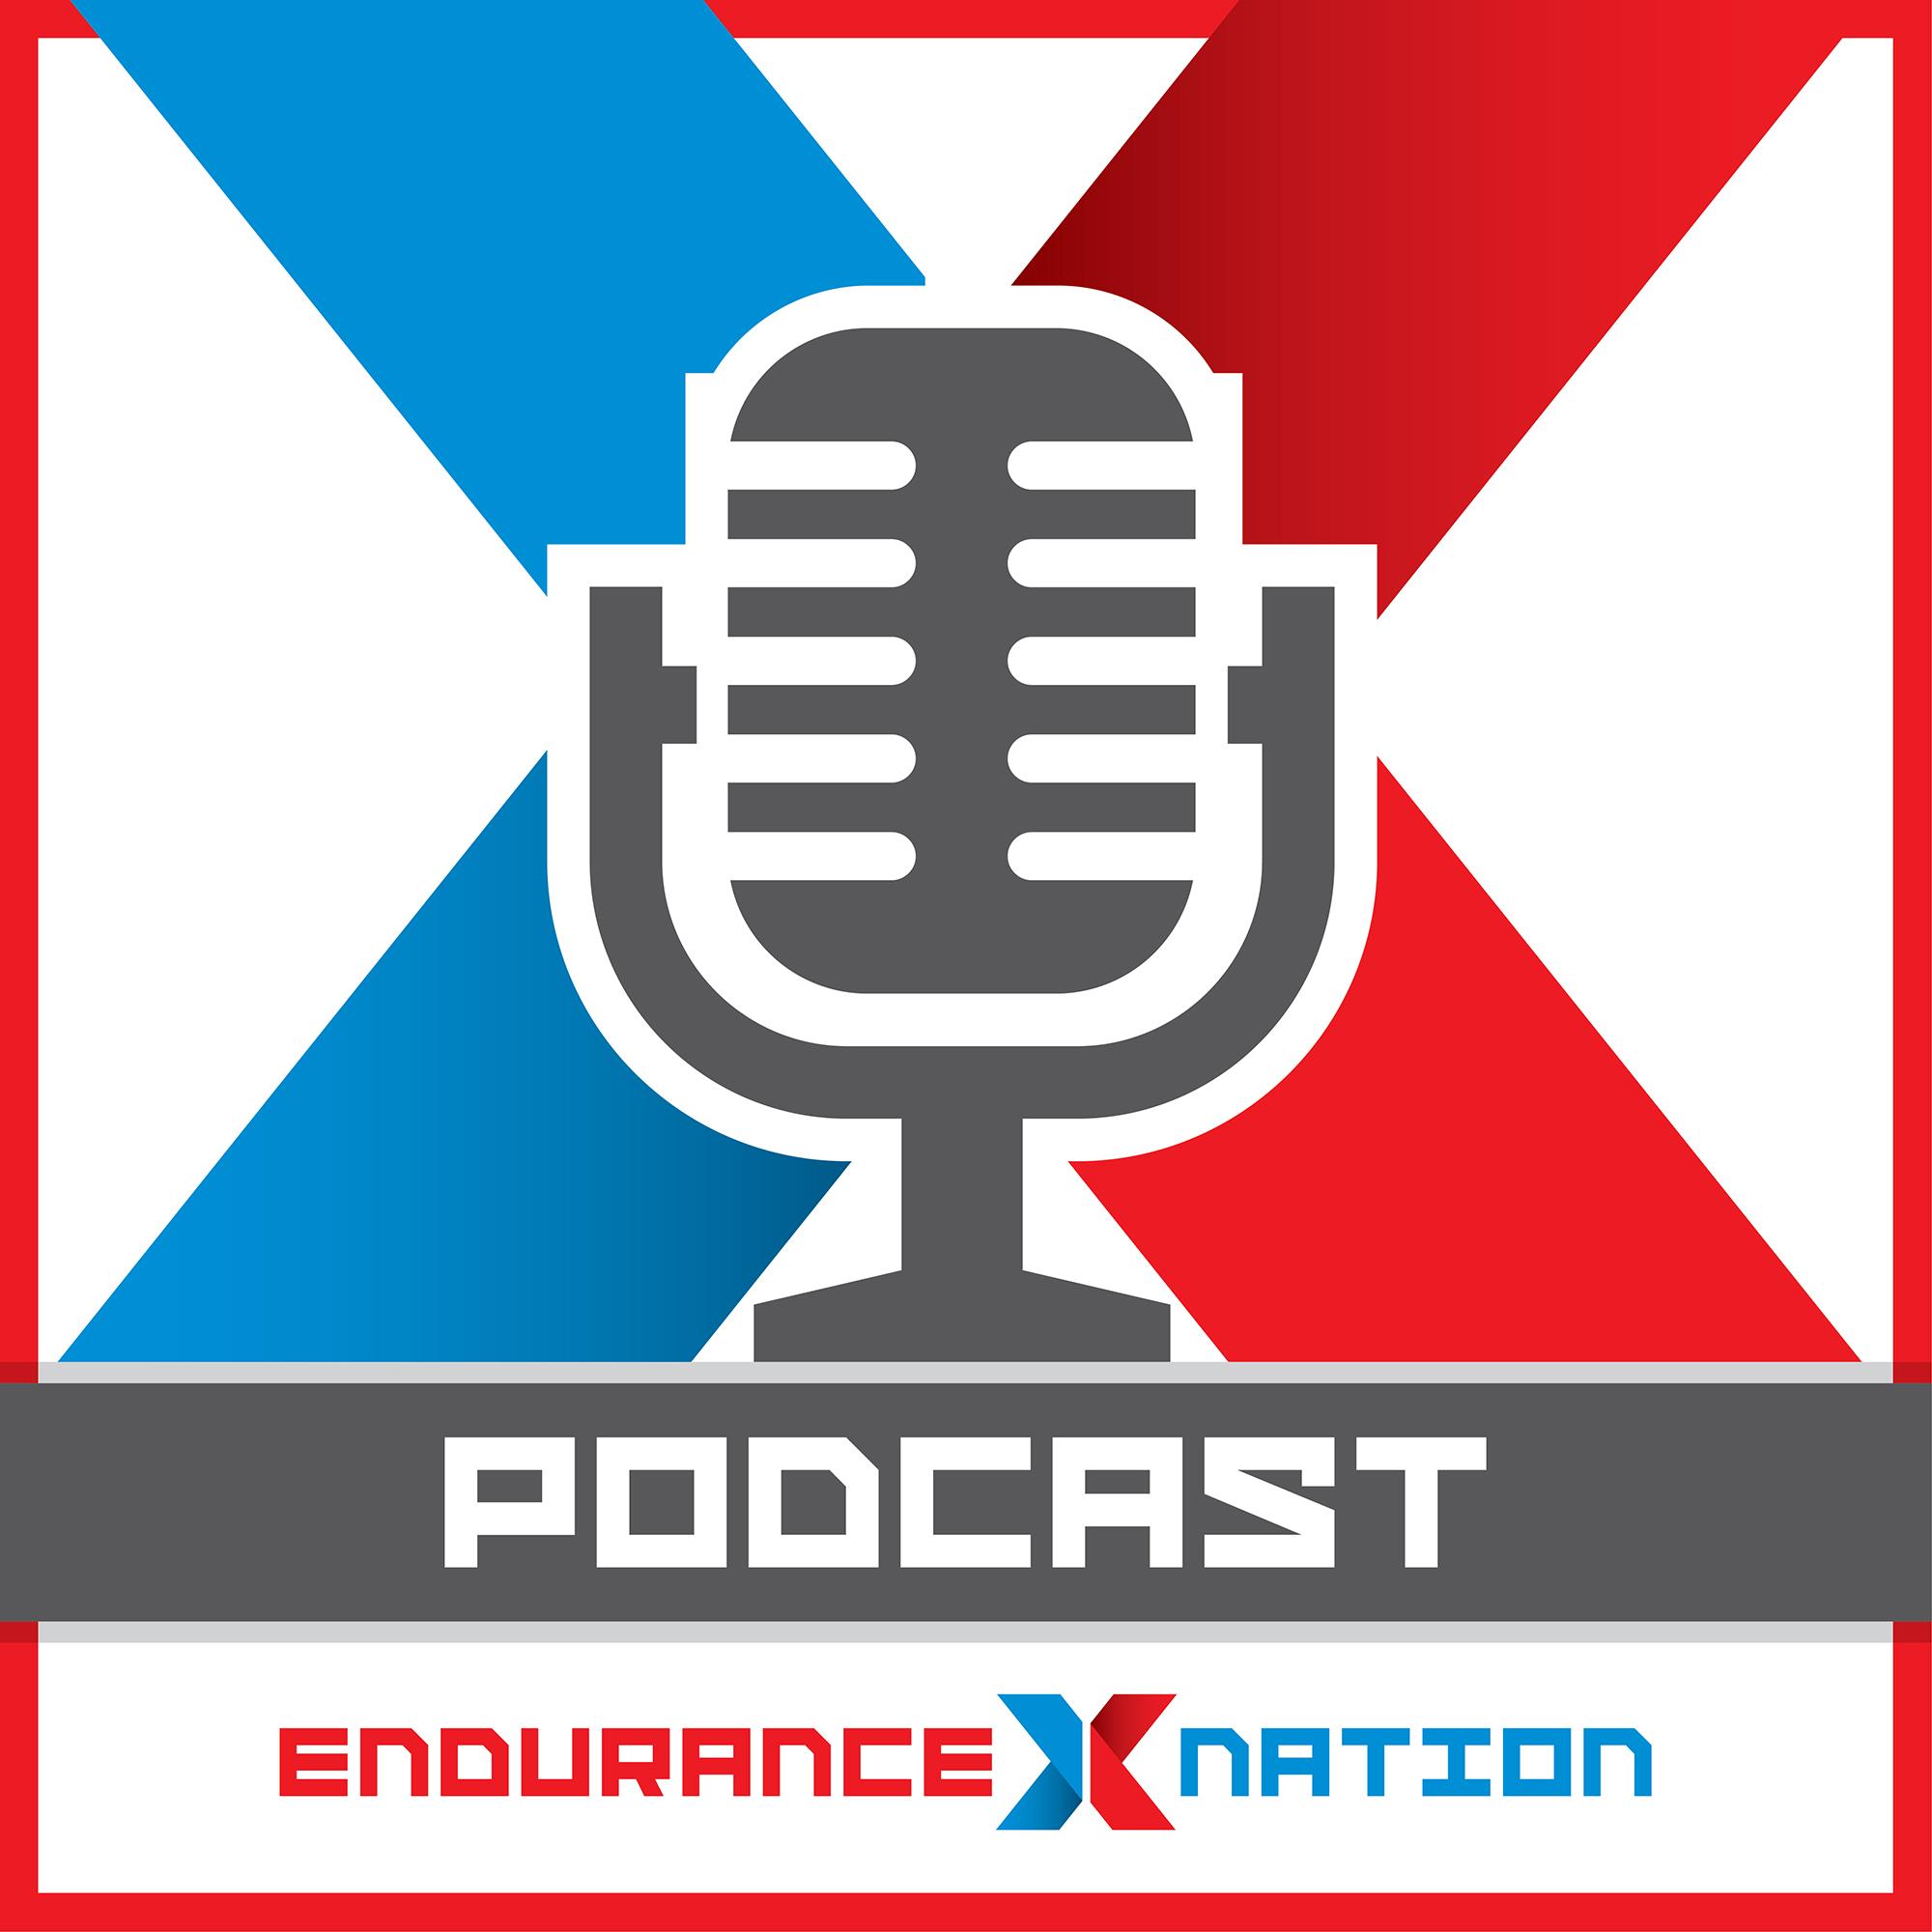 Endurance Nation Triathlon Podcast